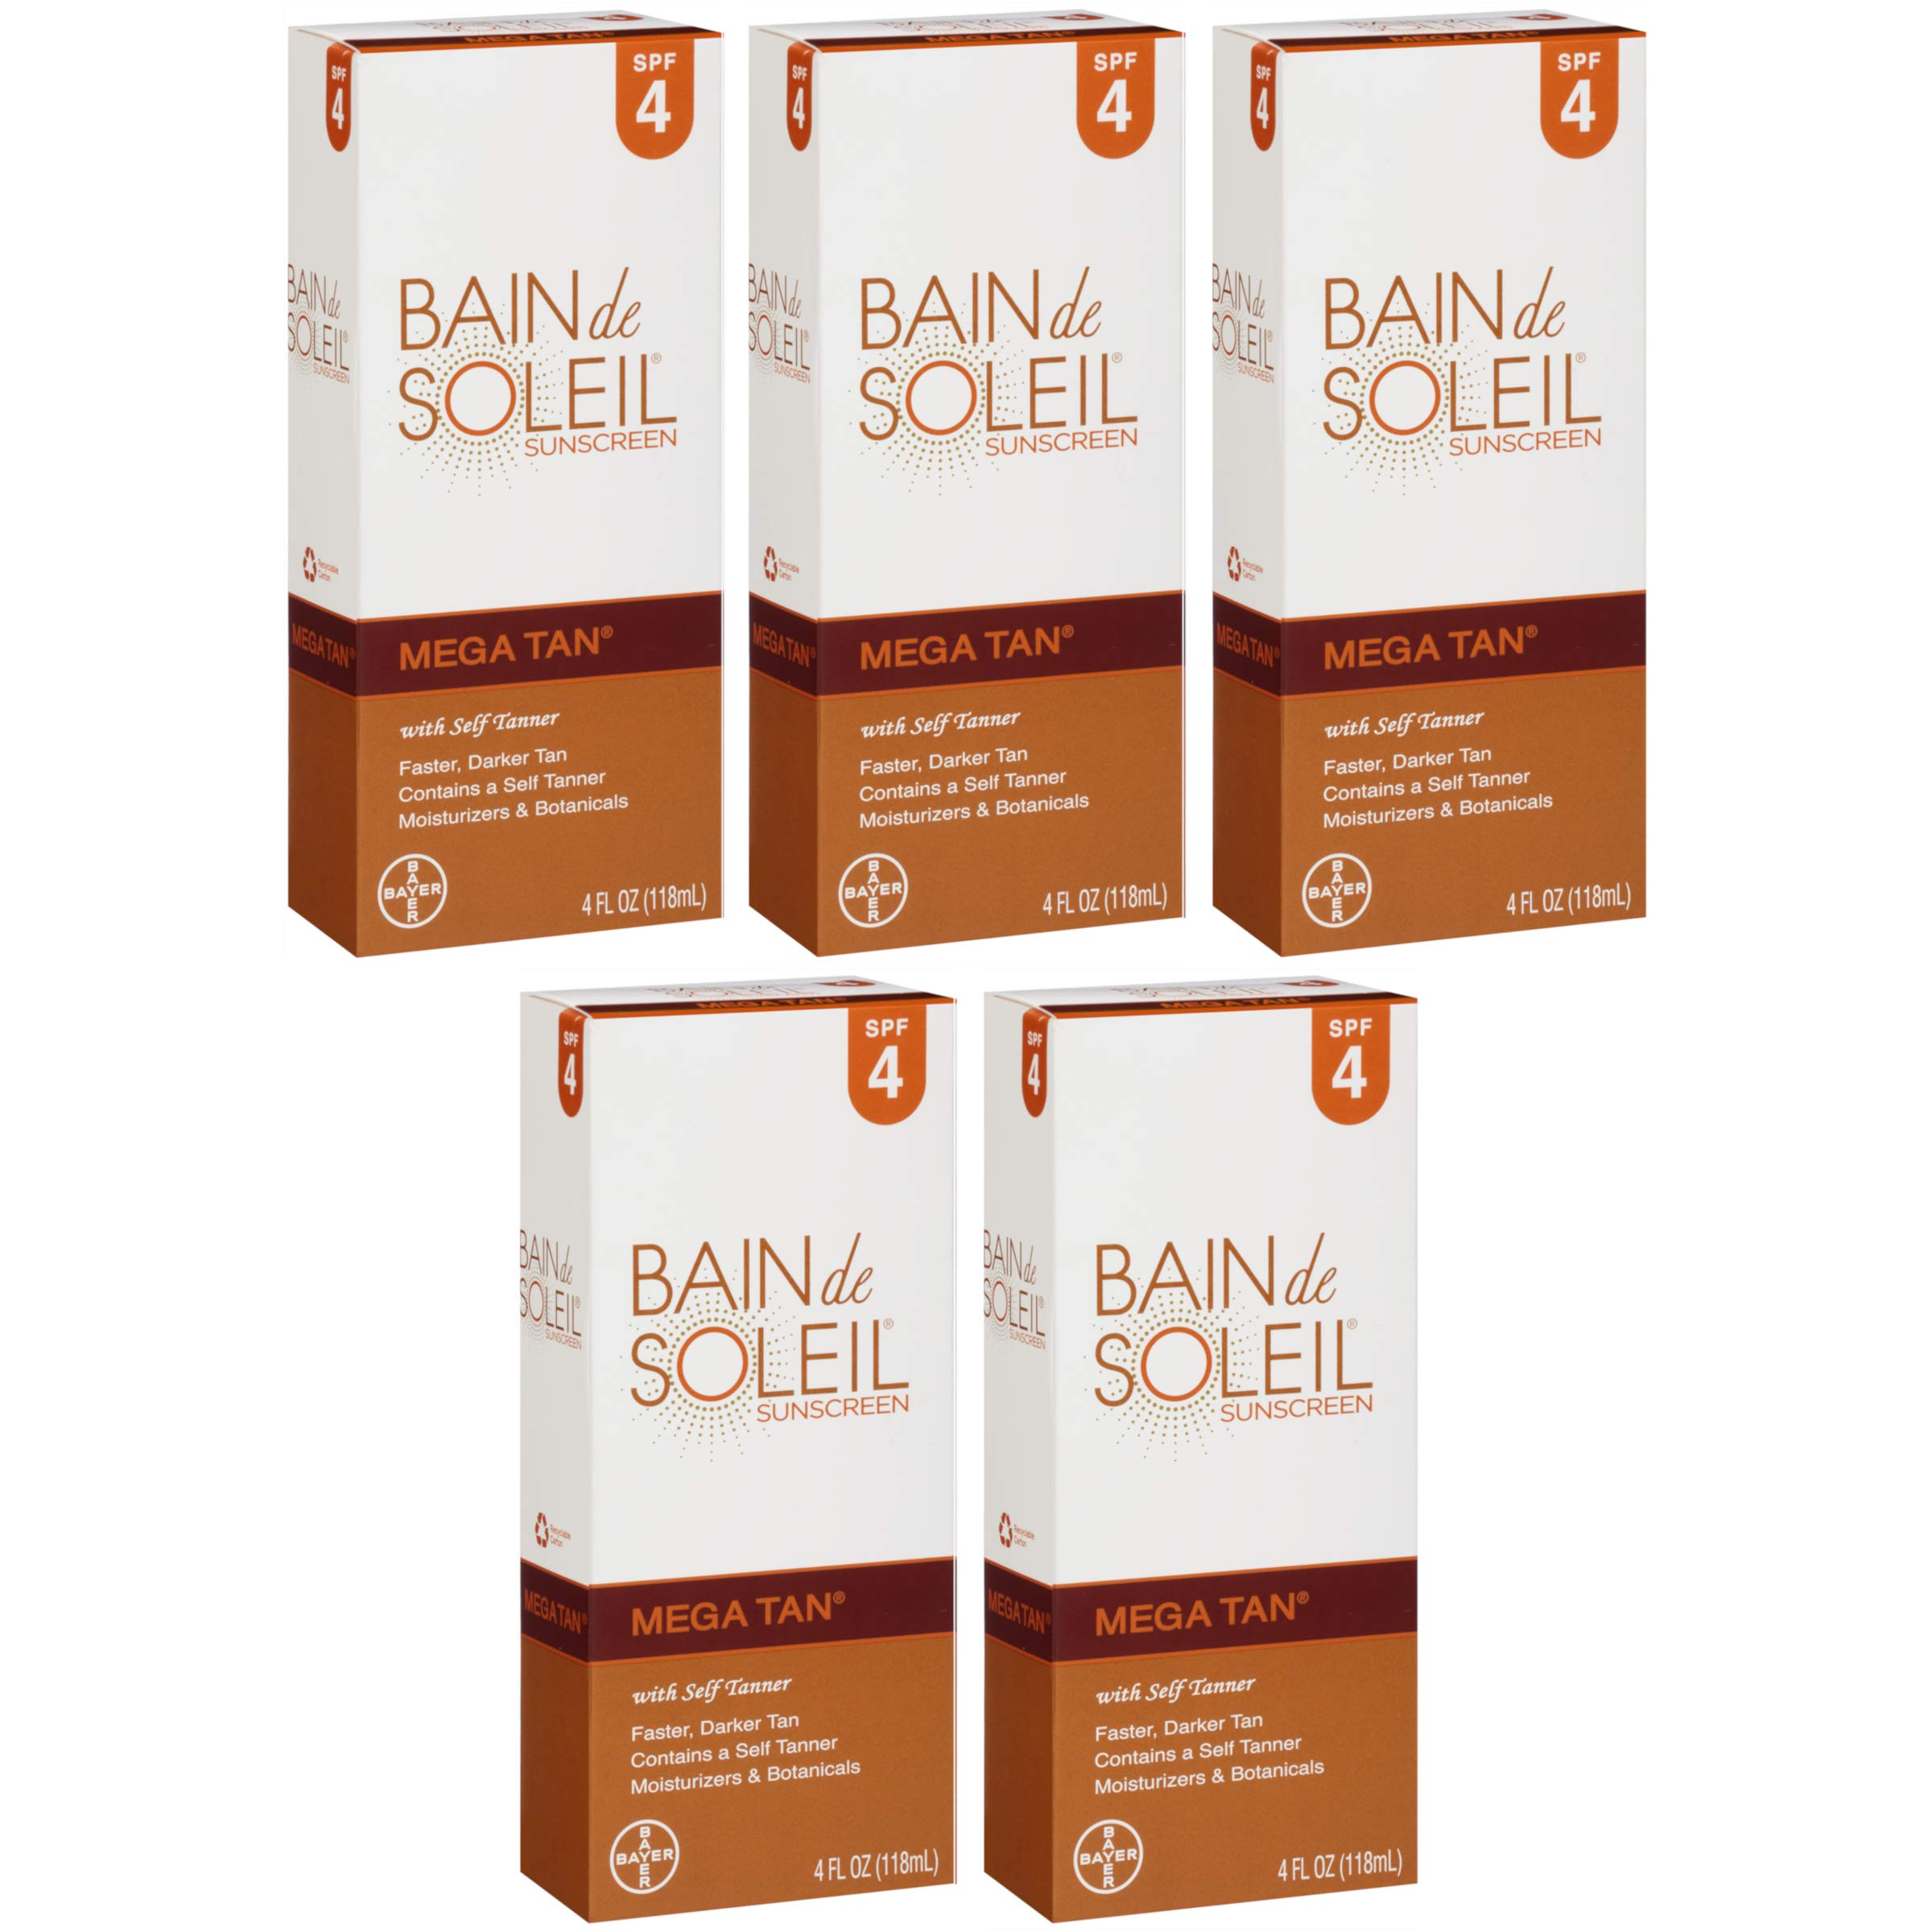 Bain de Soleil Mega Tan Sunscreen With Self Tanner, SPF 4 4 oz (Pack of 5)